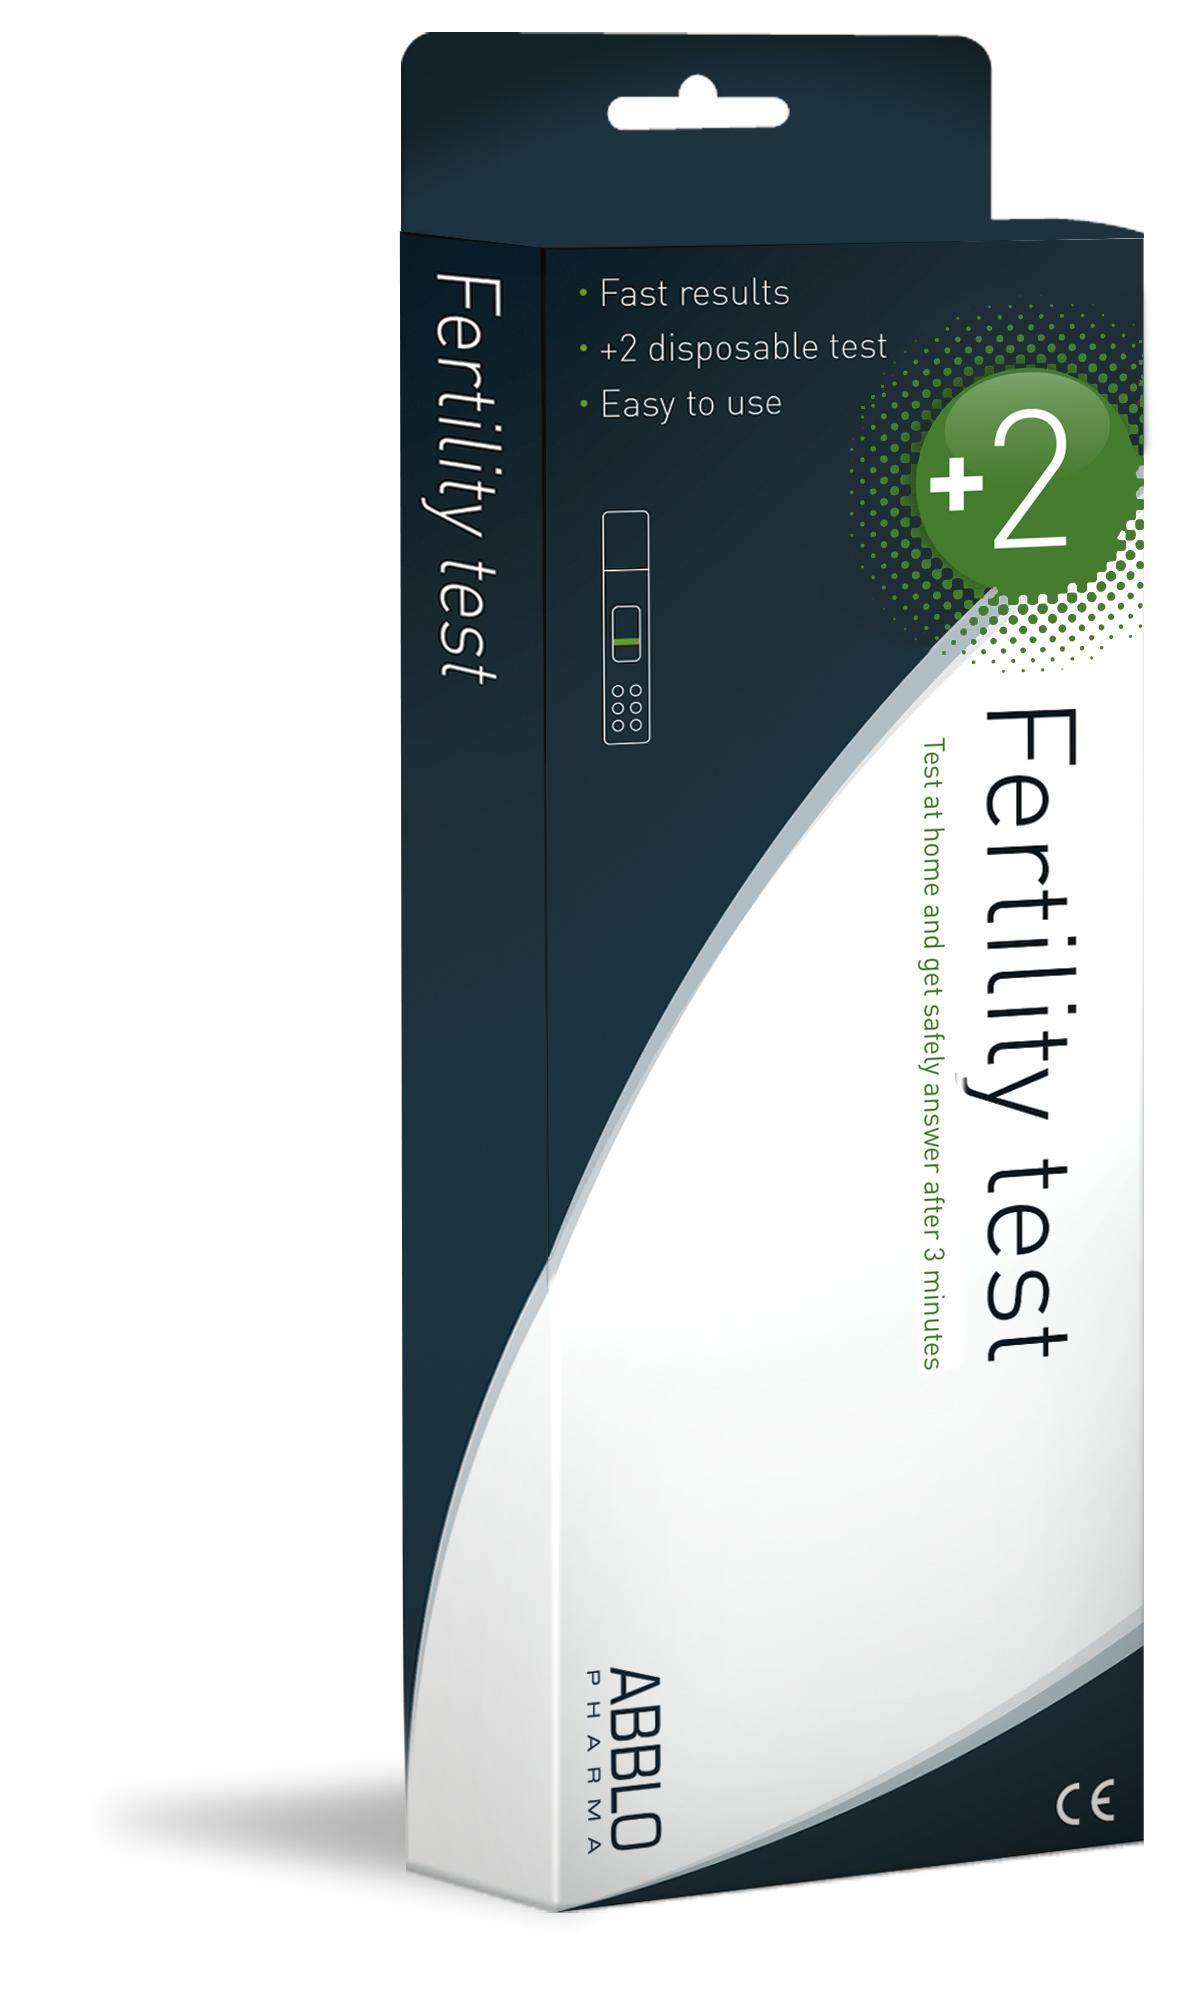 ABBLO_Pharma_Male_Fertility